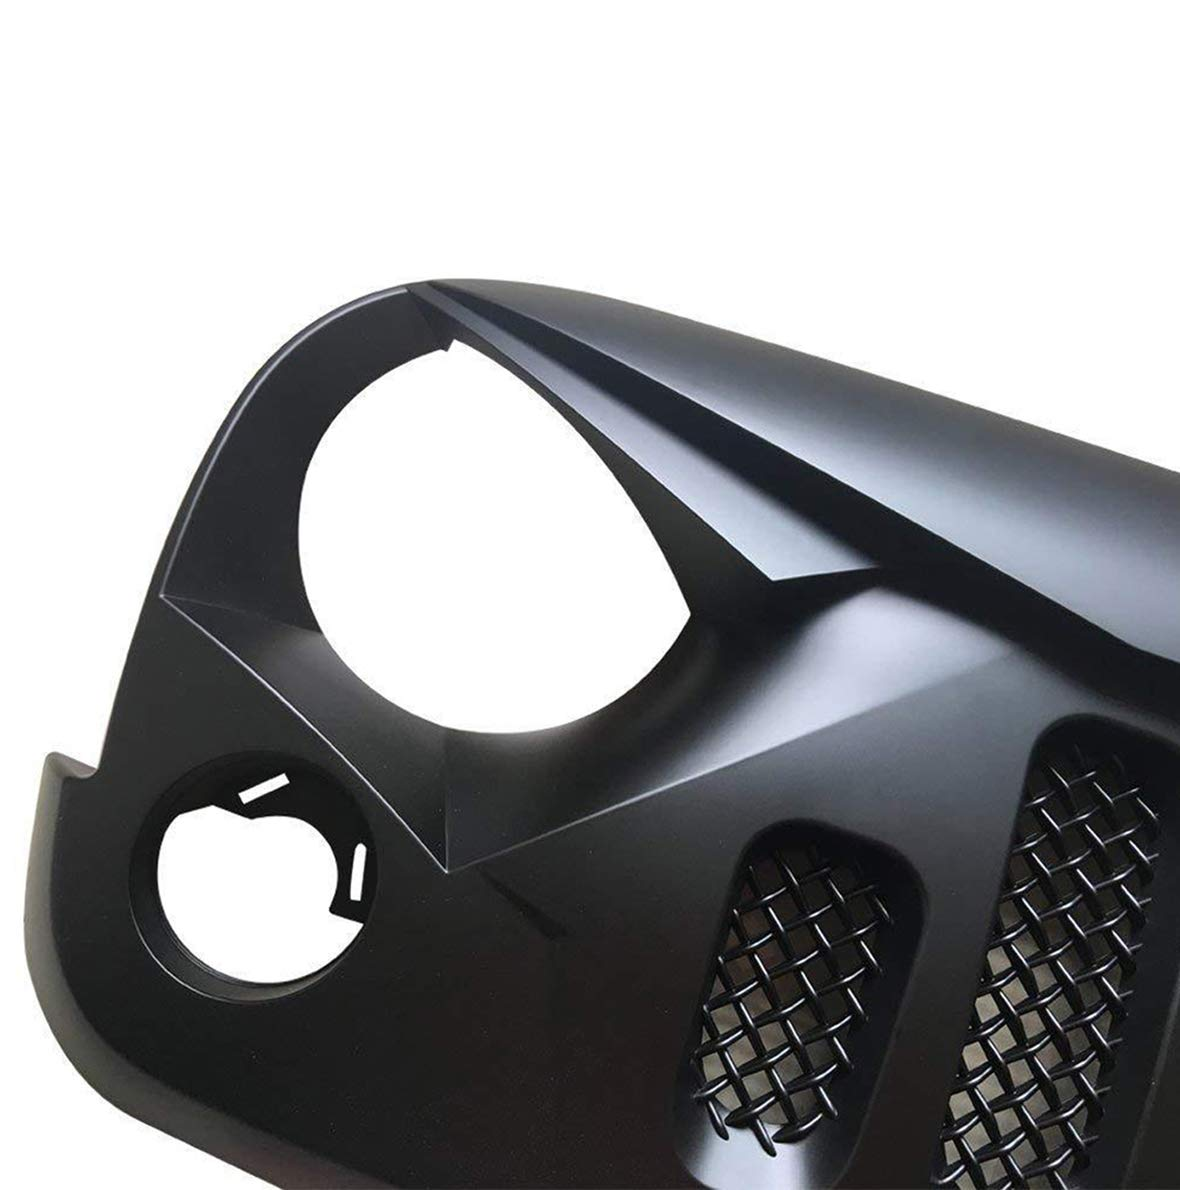 Gladiator Vader Grille Front Matte Black for 2007-2017 Jeep Wrangler JK JKU Unlimited Rubicon Sahara X Off Road Sport Exterior Accessories Parts